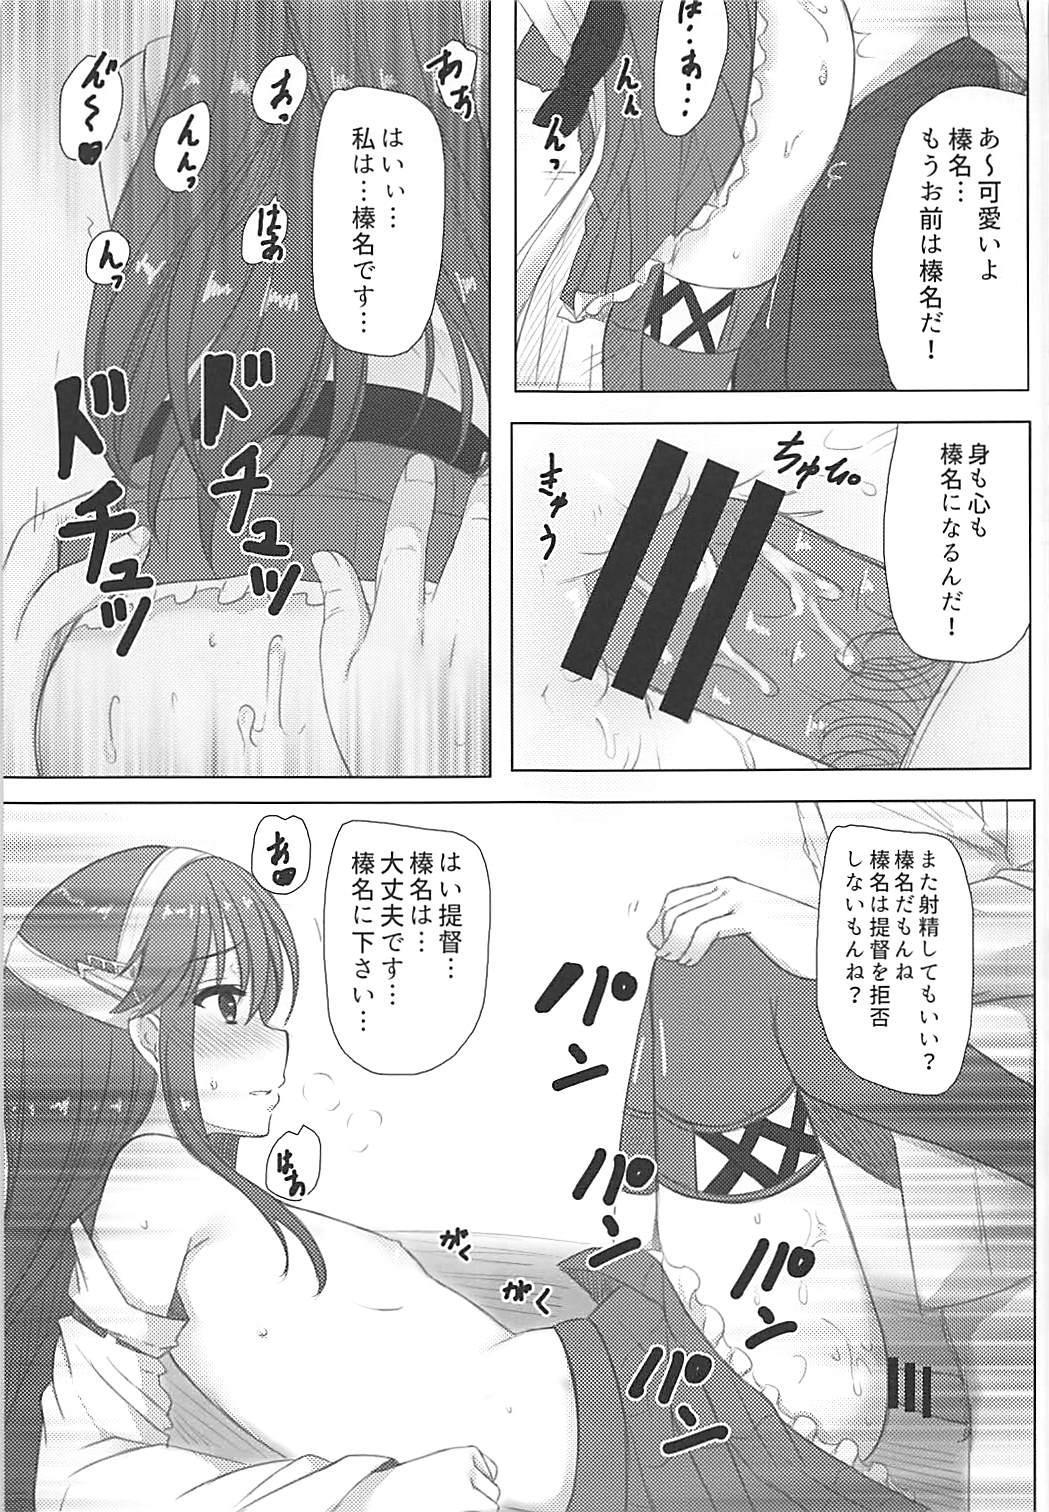 Haruna-kun Celebration 13